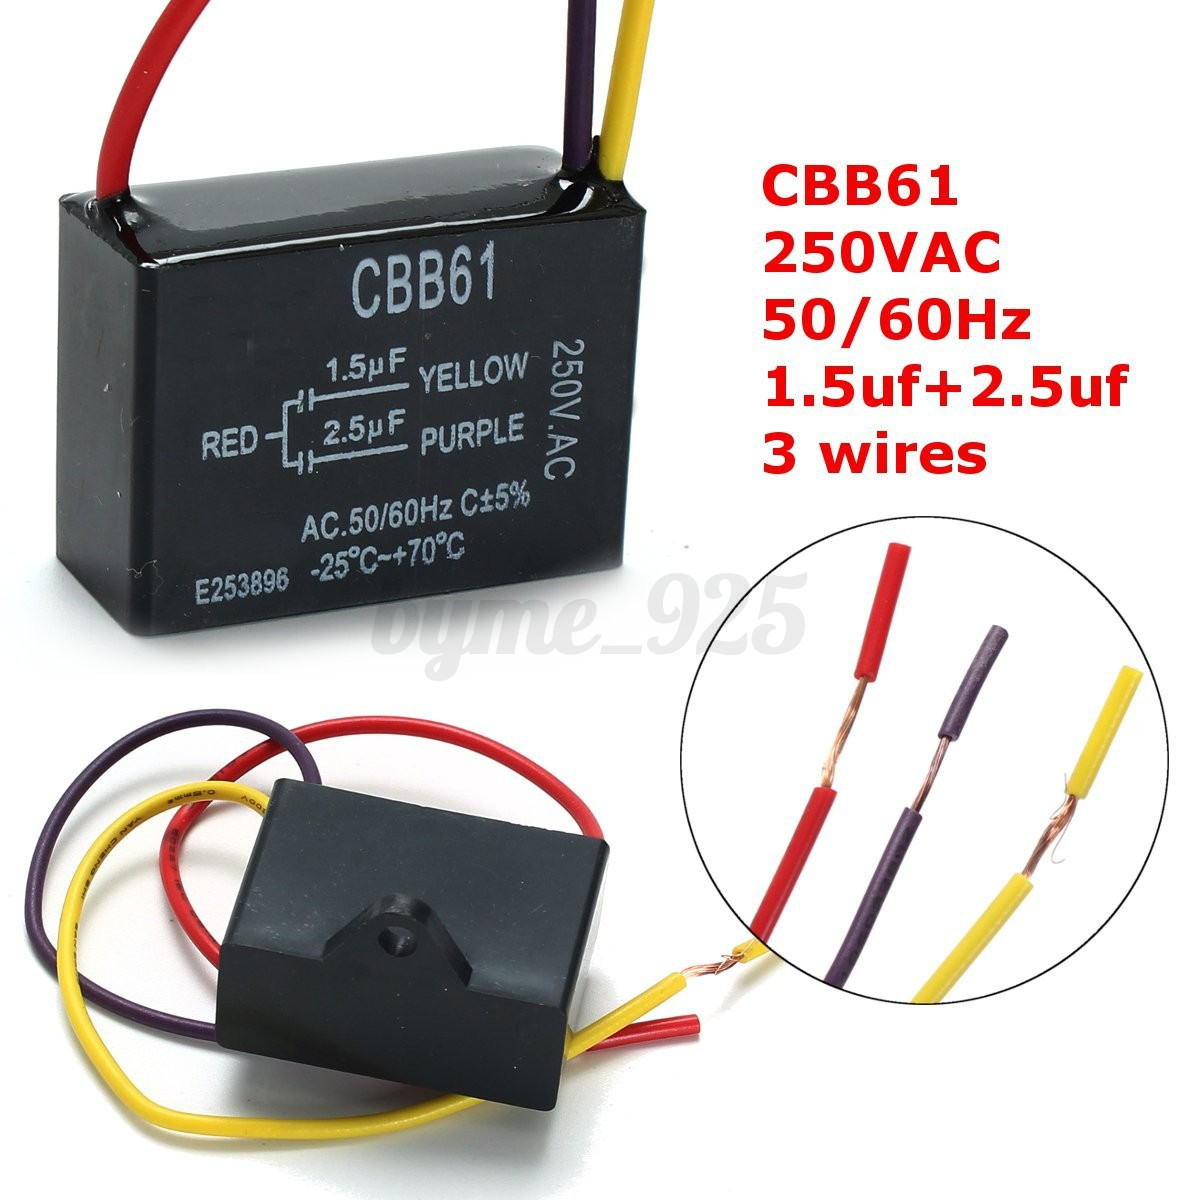 CBB61 1.5uF+2.5uF 50/60Hz 3 Wire 220V AC Ceiling Fan Capacitor -25 ...